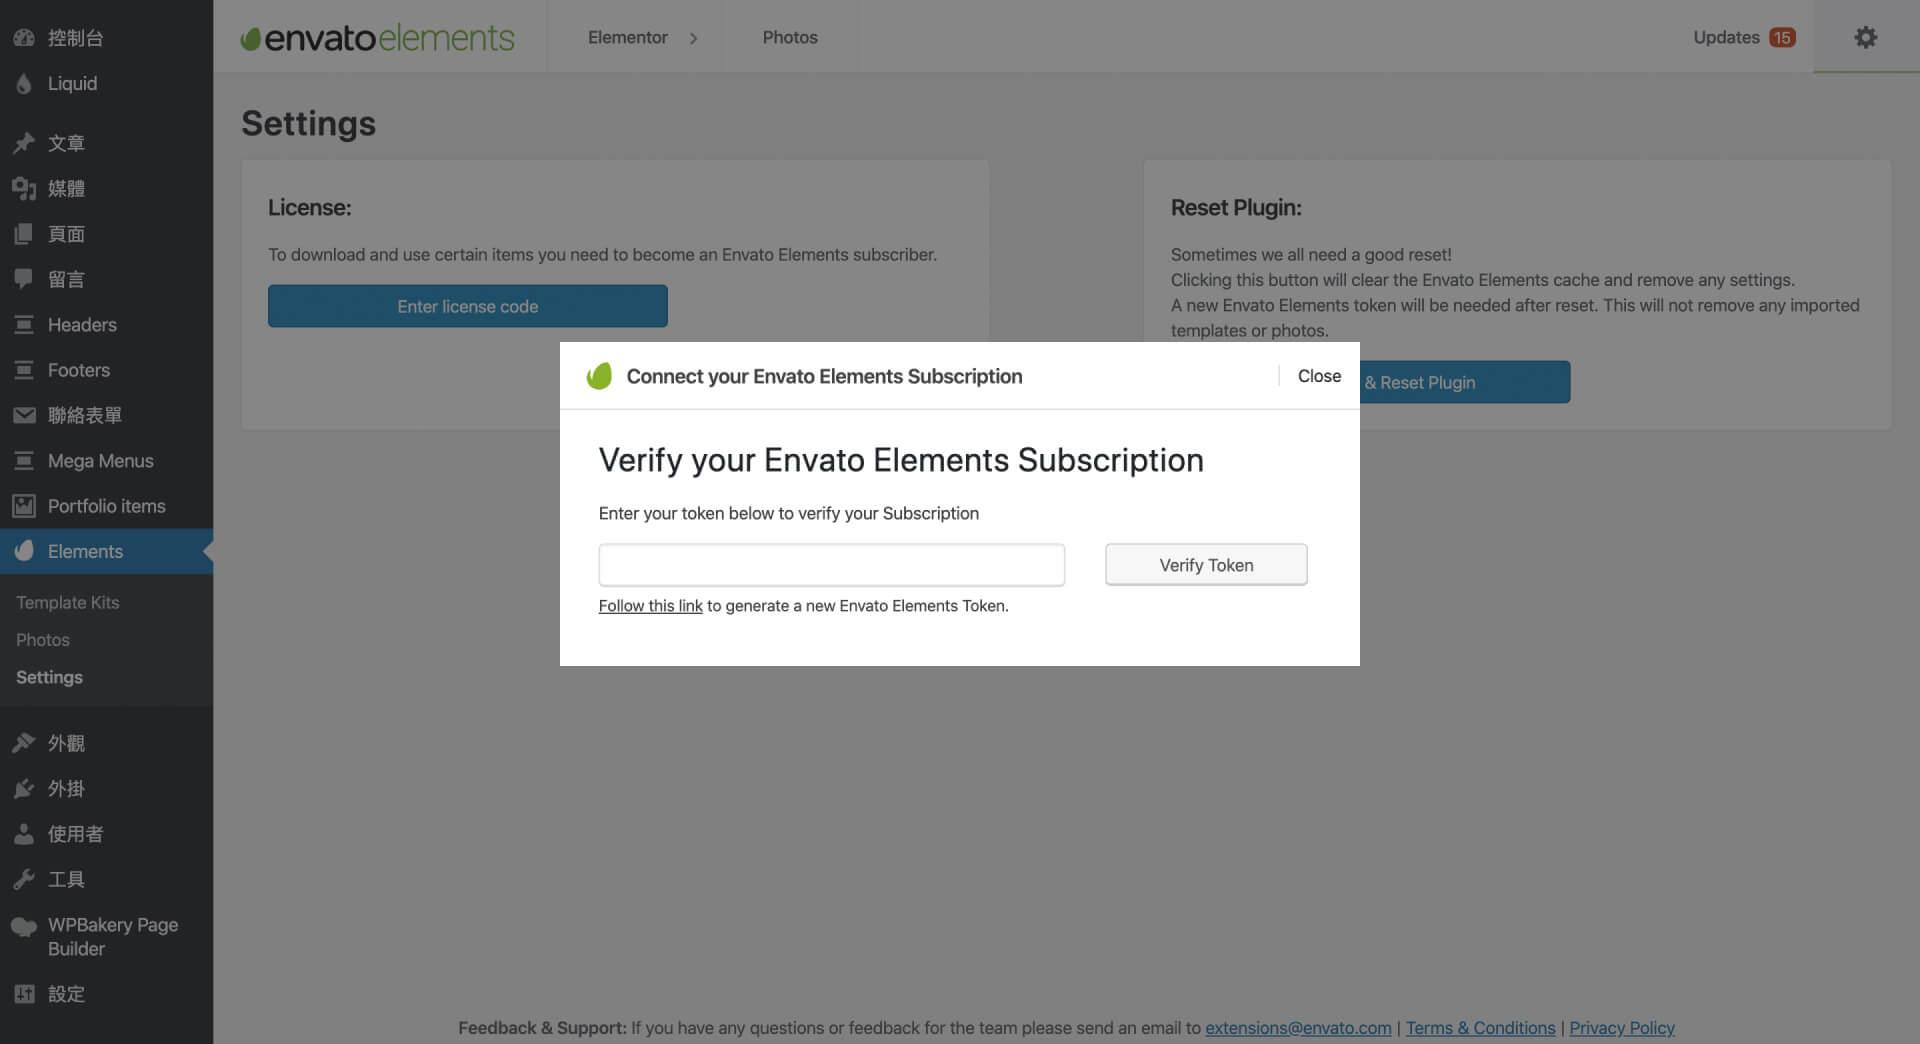 Envato Elements — Photos & Elementor Templates 外掛設定介面 — 輸入驗證碼 Token-IrvingLab 爾文實驗室